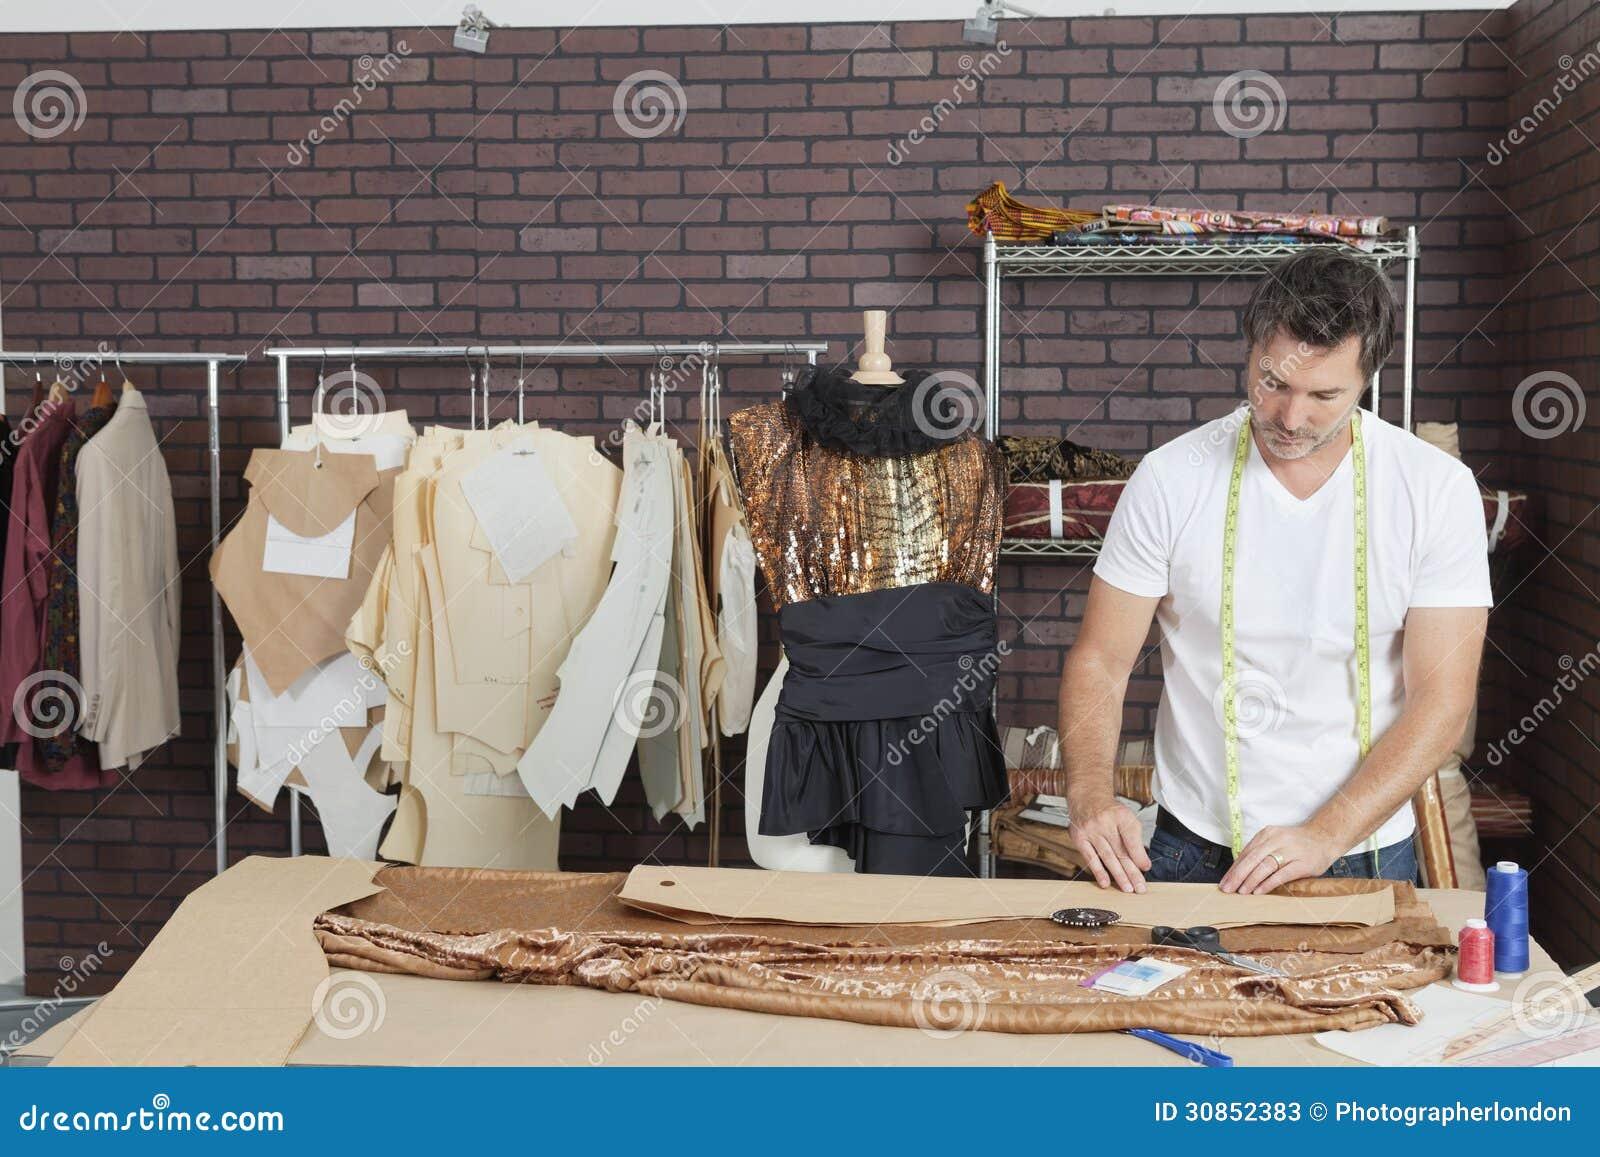 Online clothing design studio